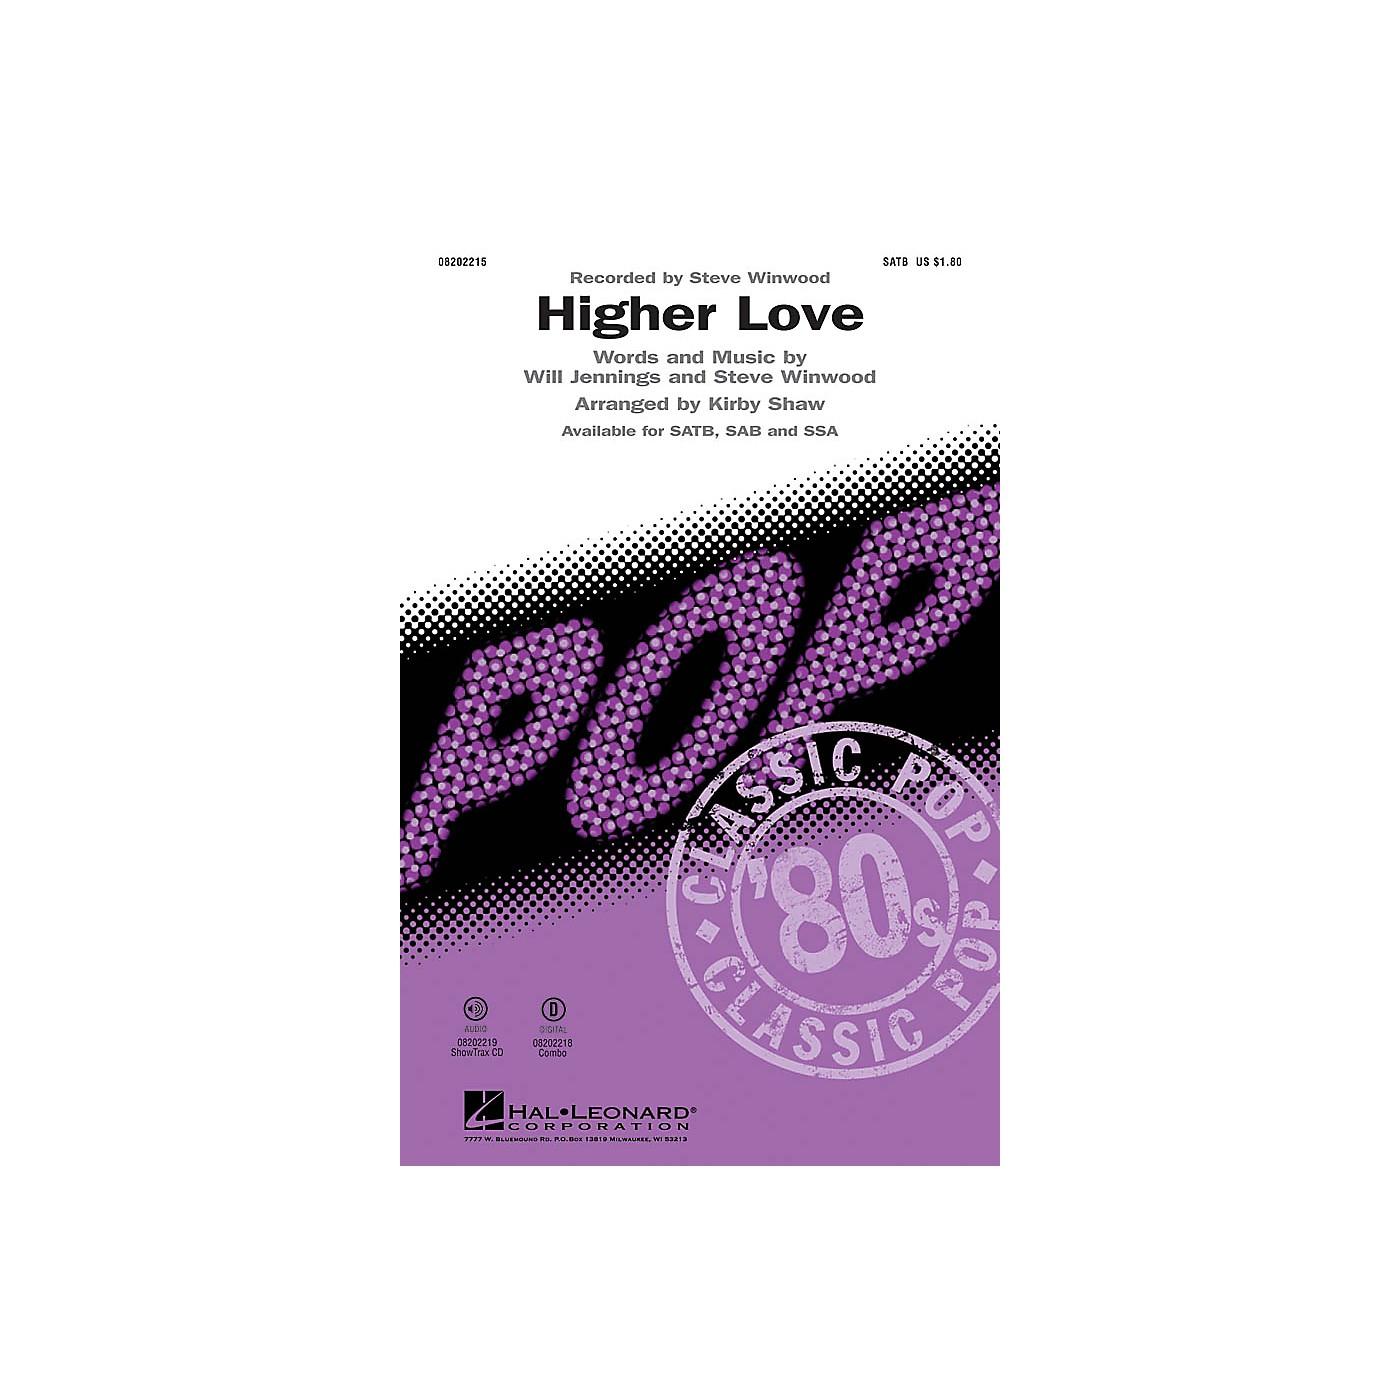 Hal Leonard Higher Love ShowTrax CD by Steve Winwood Arranged by Kirby Shaw thumbnail